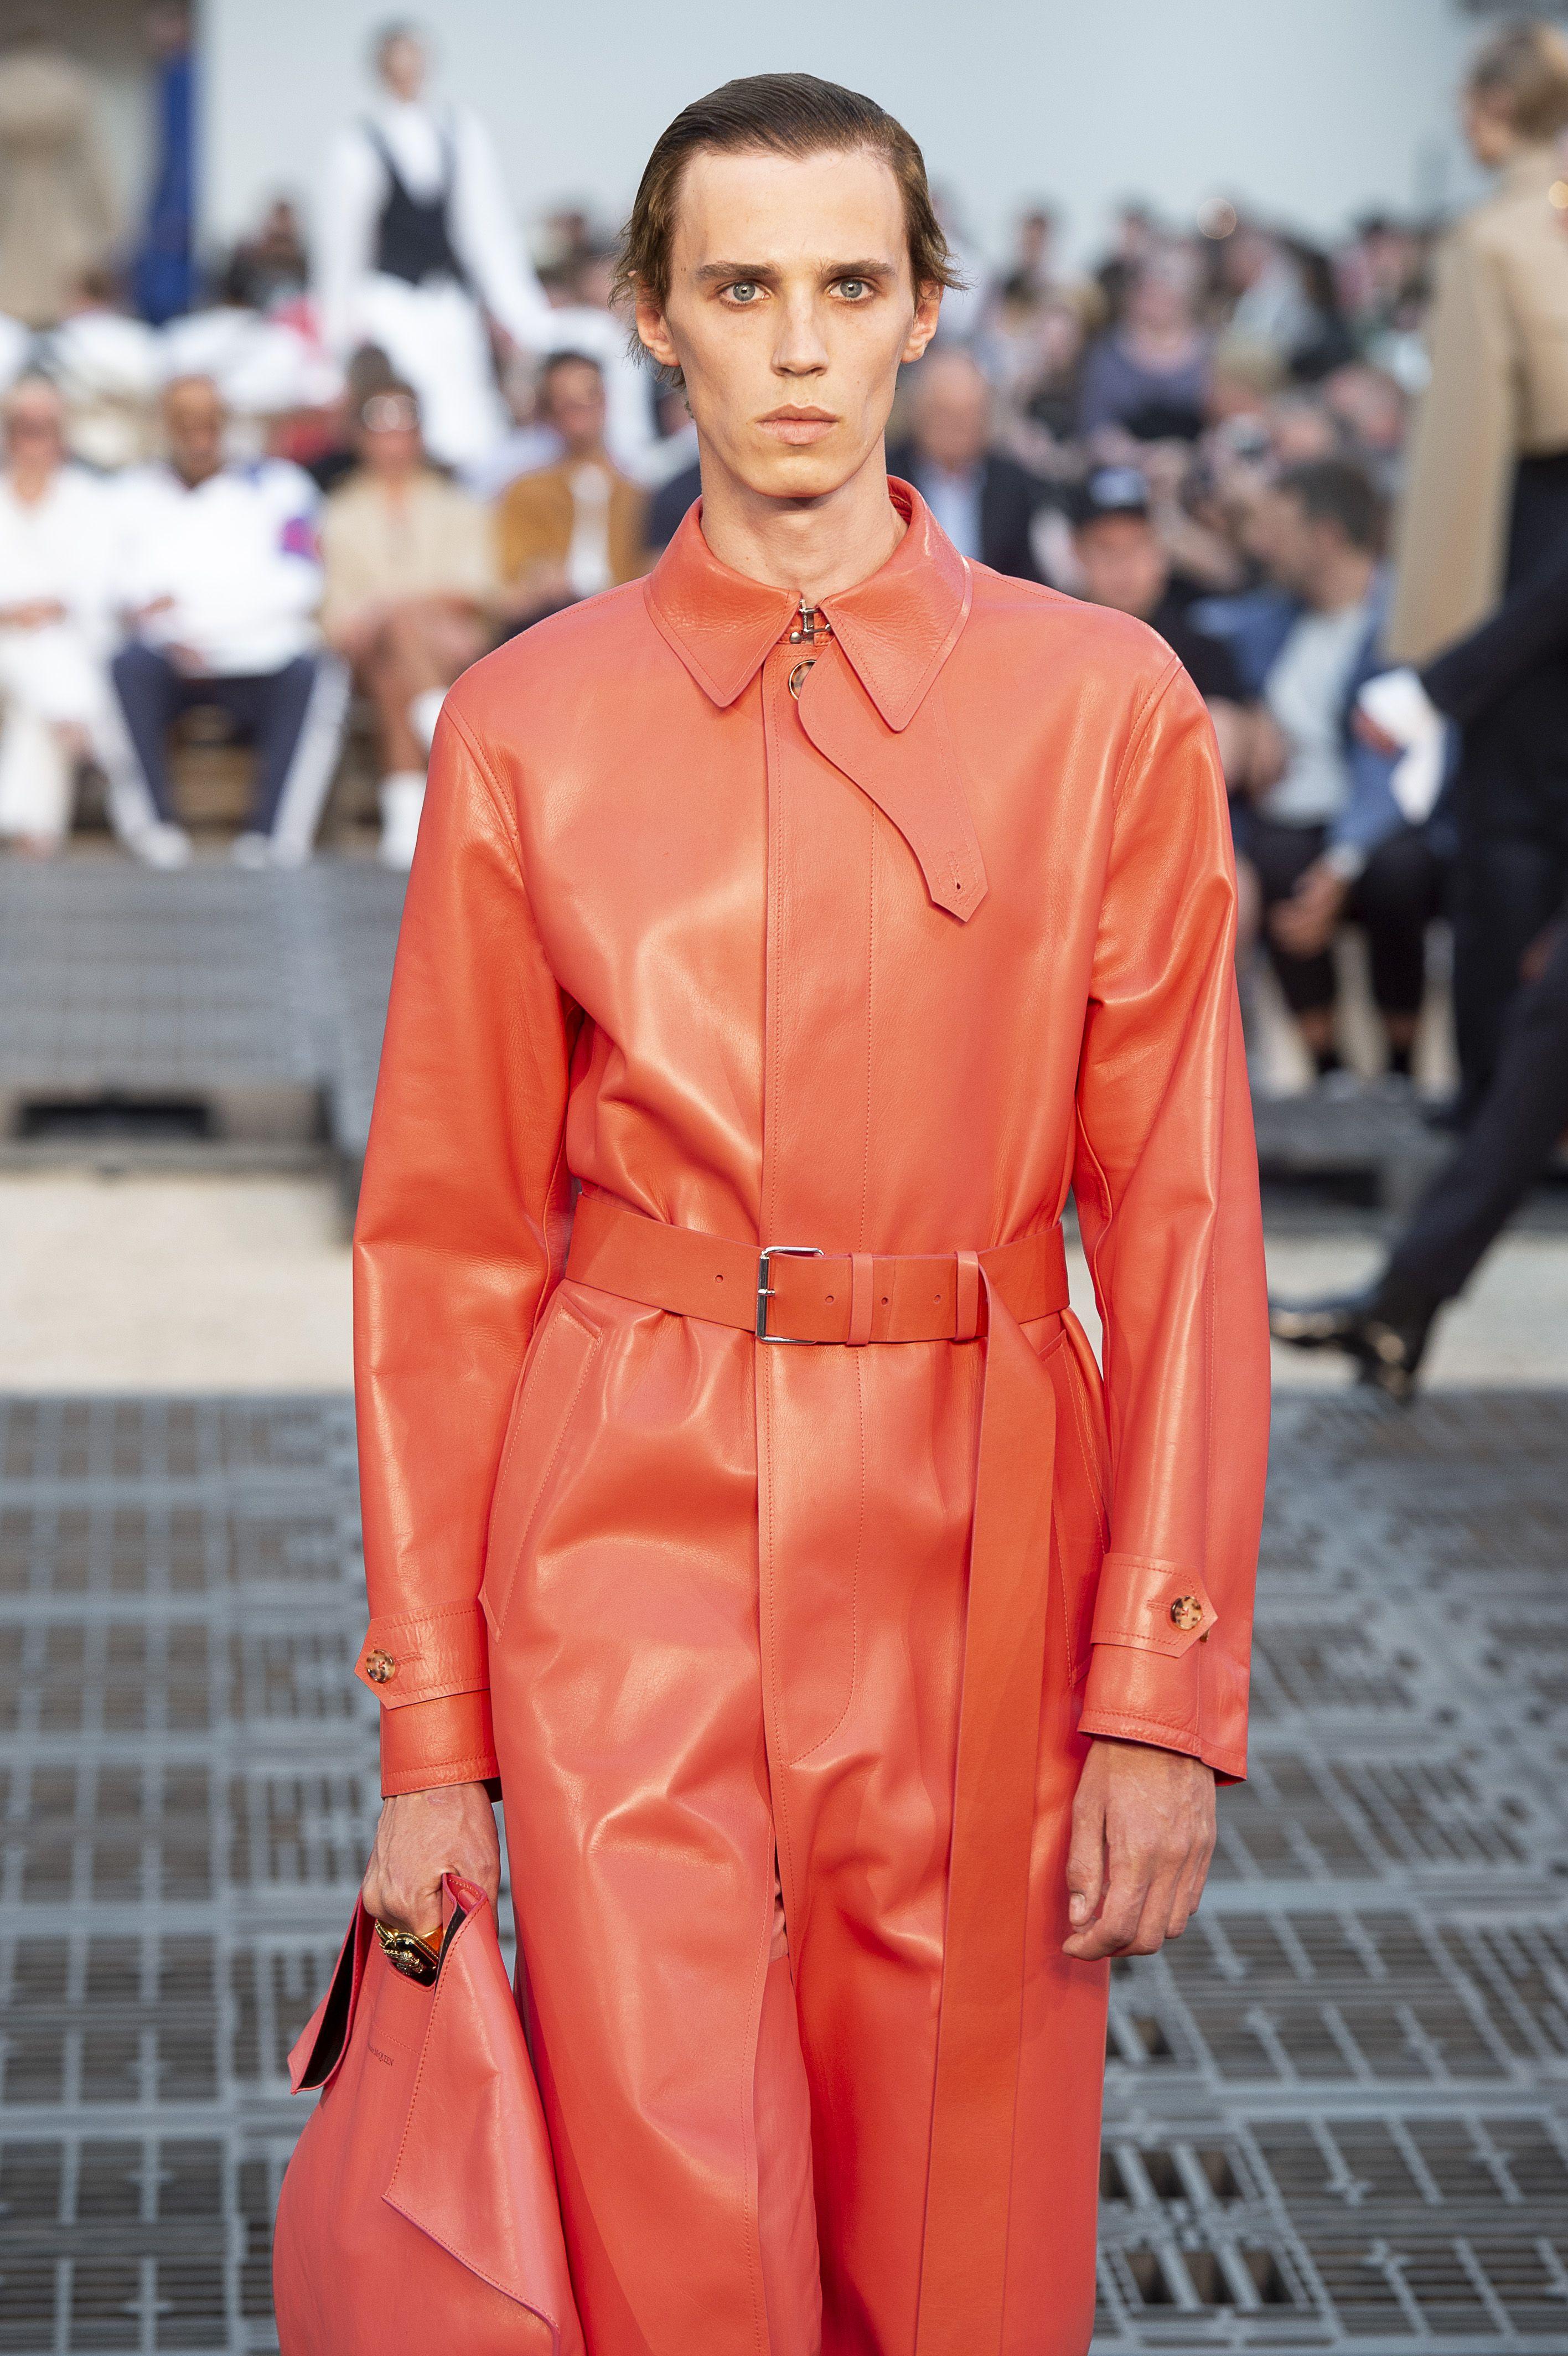 Model on the catwalk Alexander McQueen show, Runway, Spring Summer 2019, Paris Fashion Week Men's, France – 22 Jun 2018